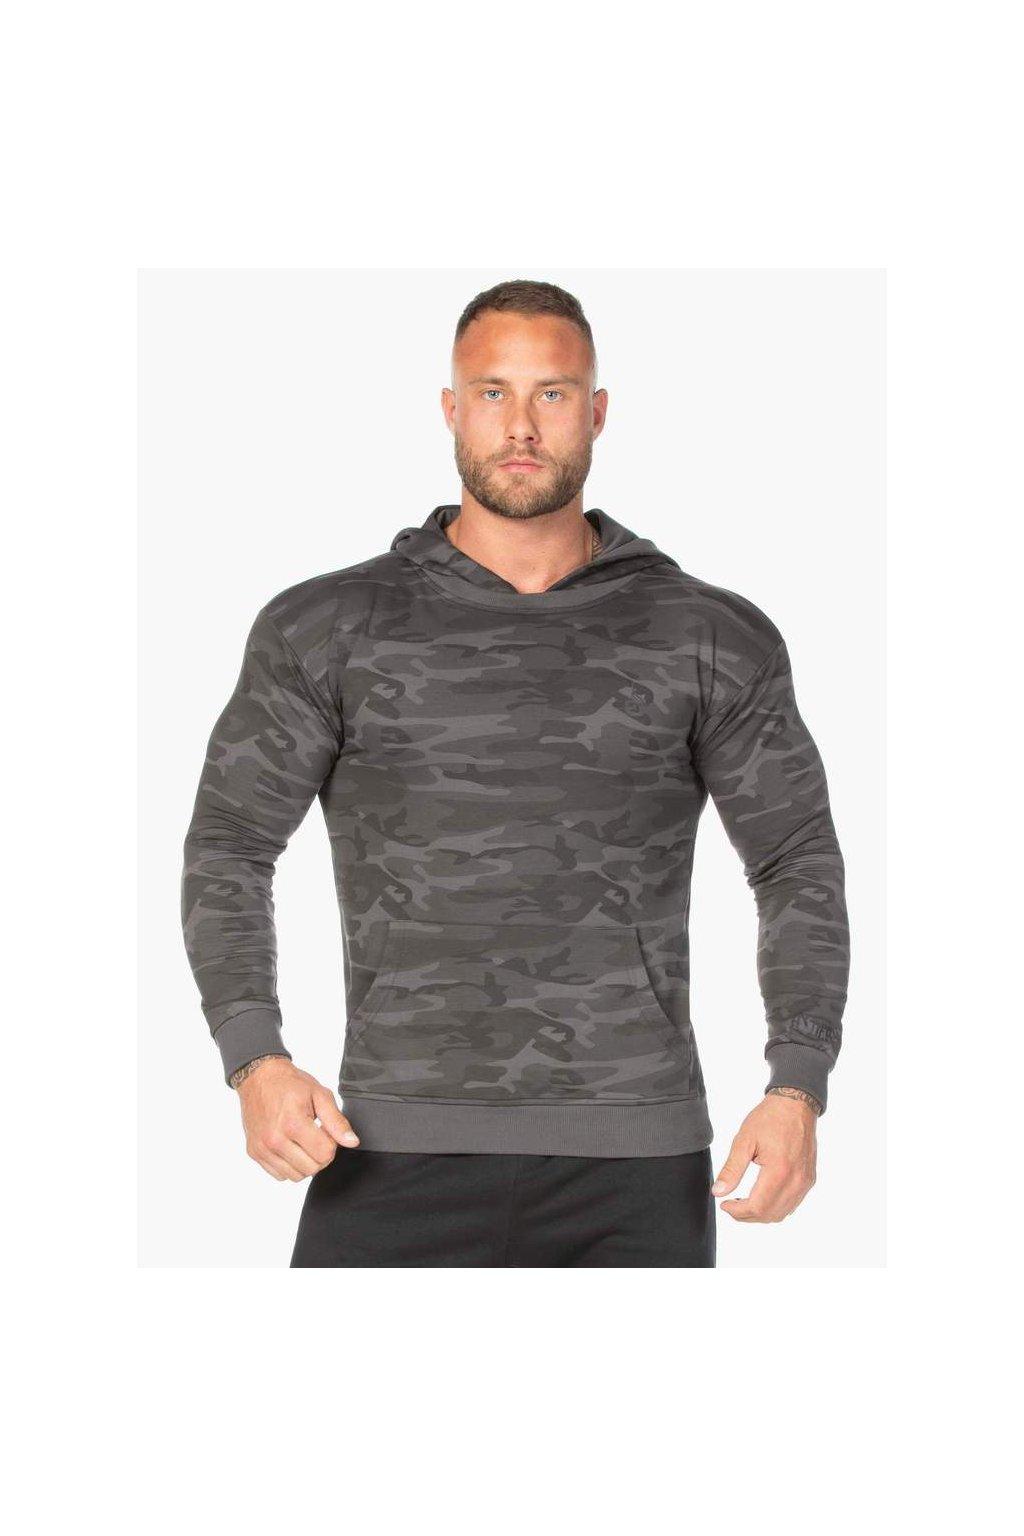 camo pullover hoodie black camo clothing ryderwear 204696 1000x1000